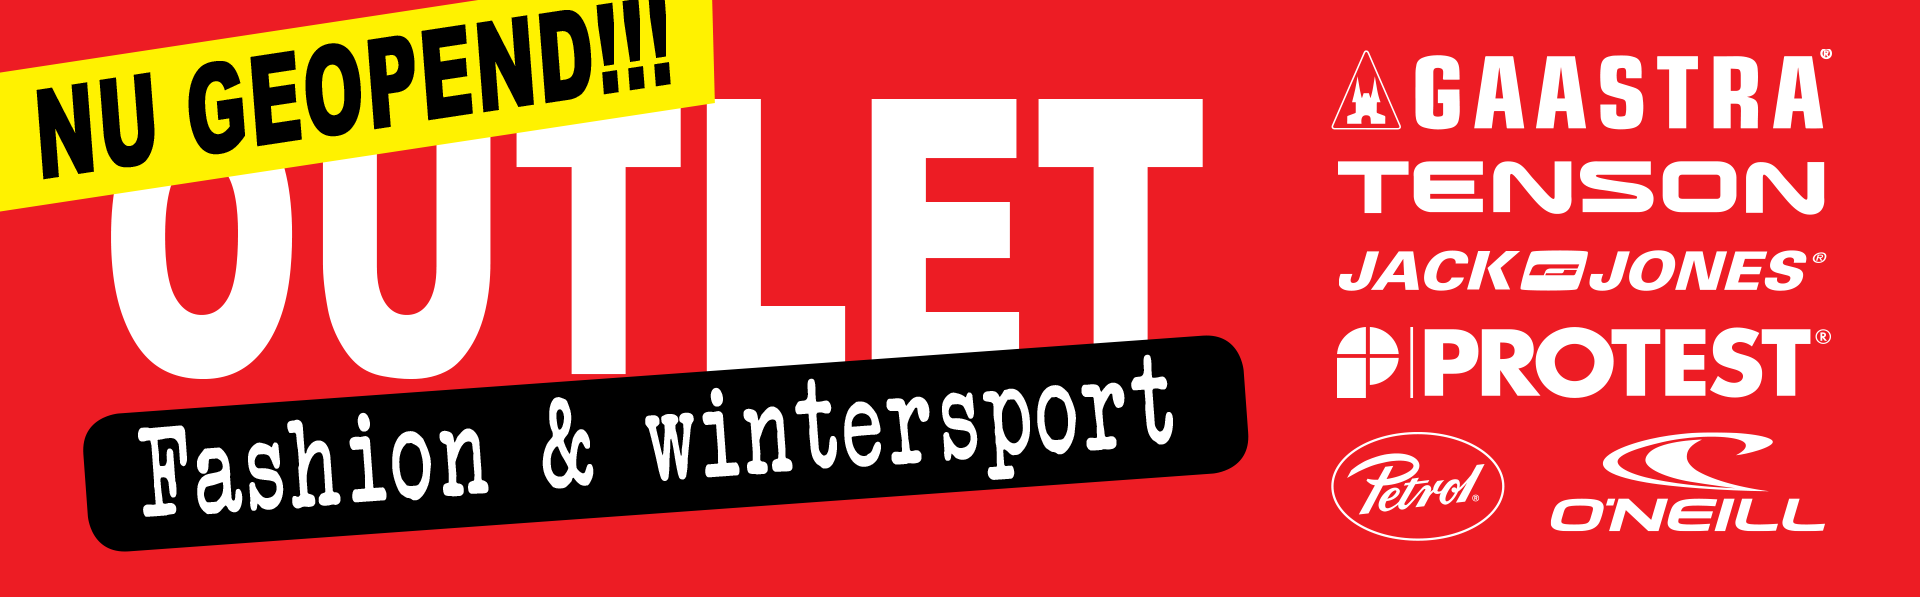 De Wintersport Outlet